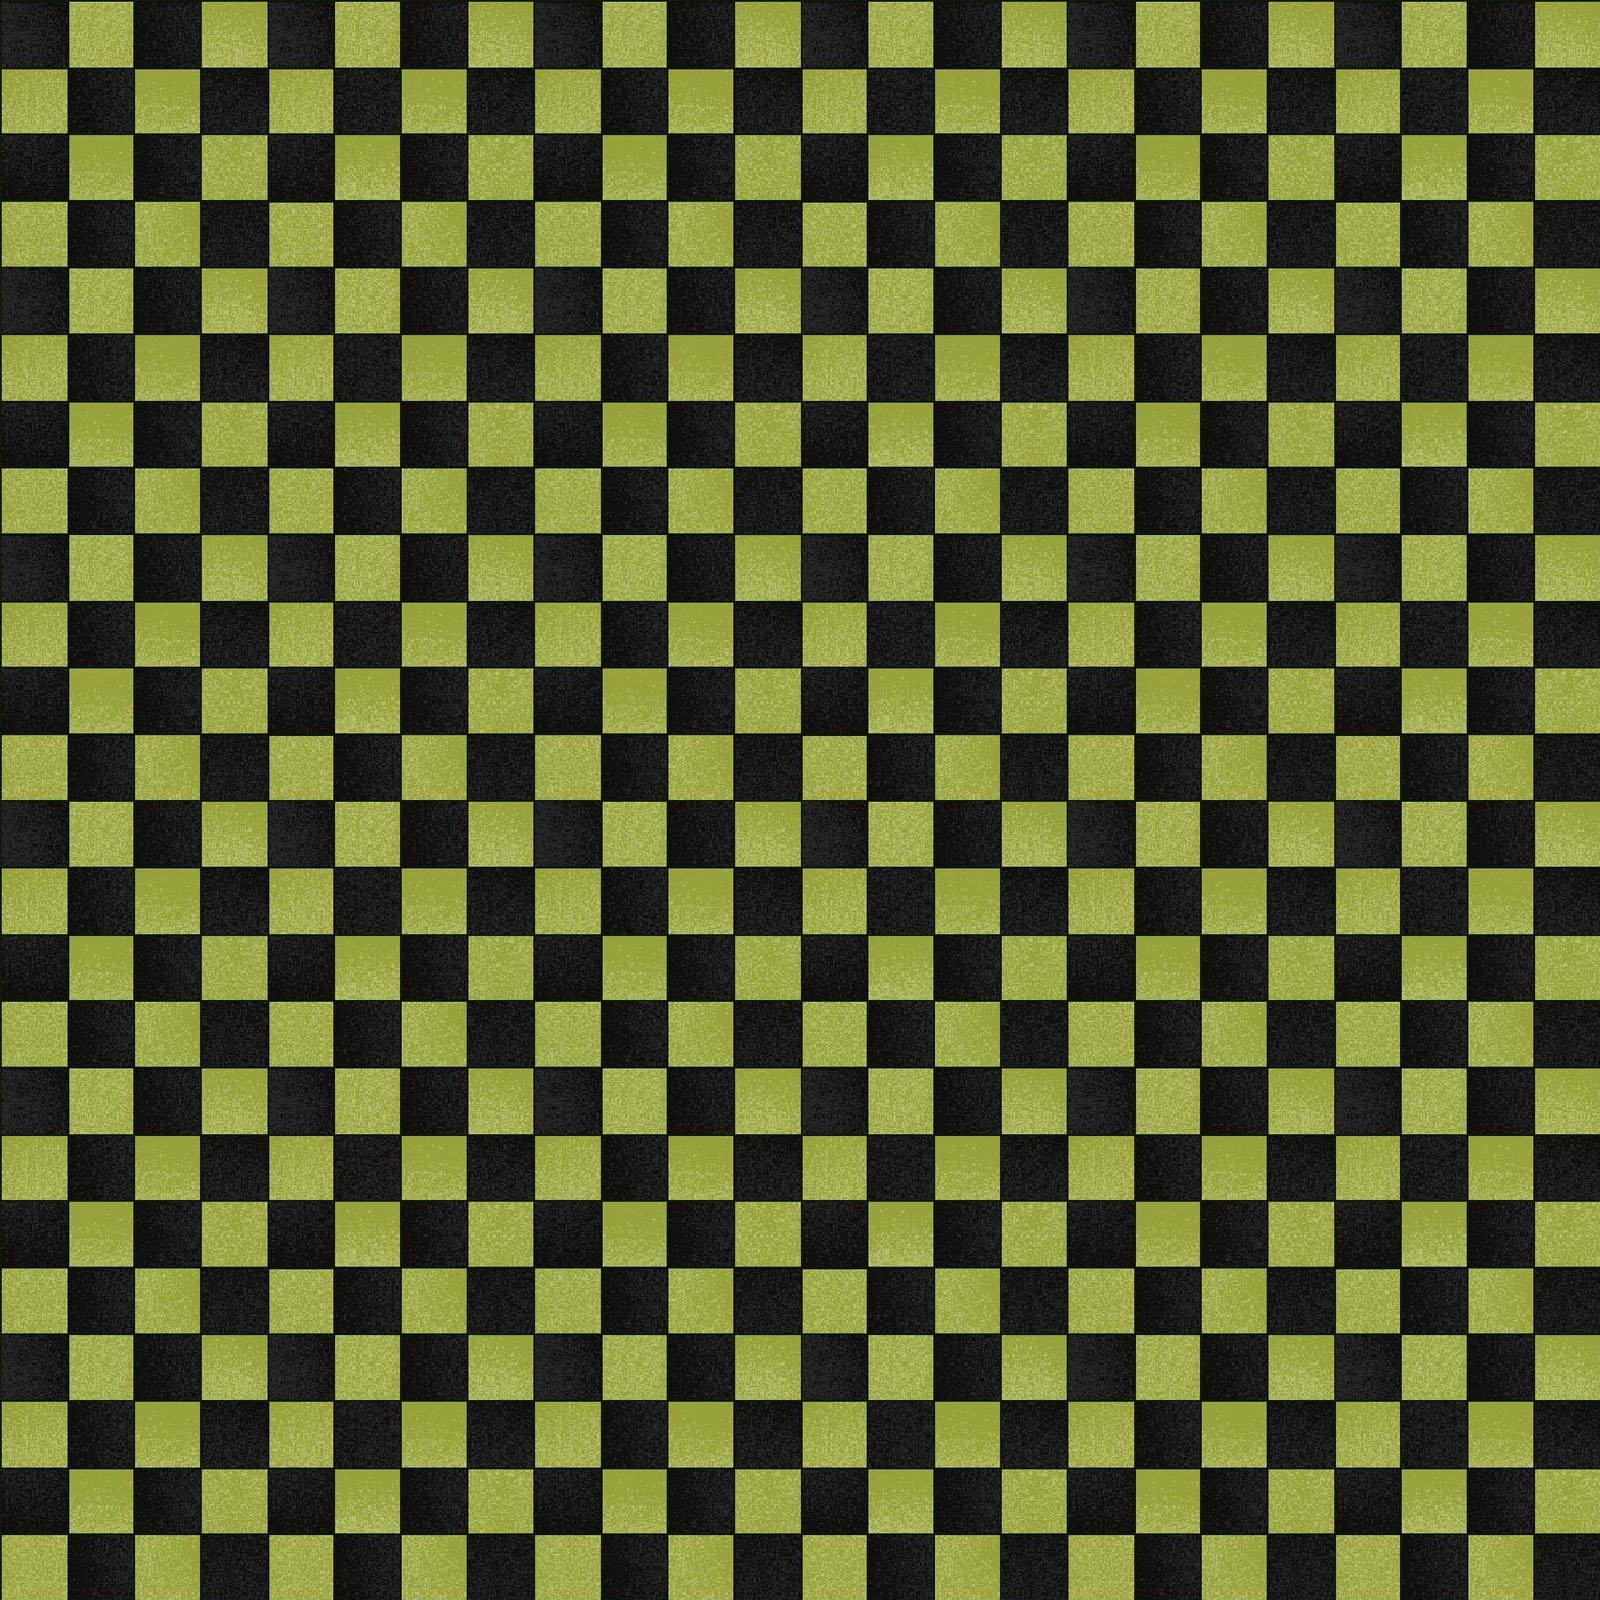 Halloweenie Simple Checkerboards MAS8627-JG